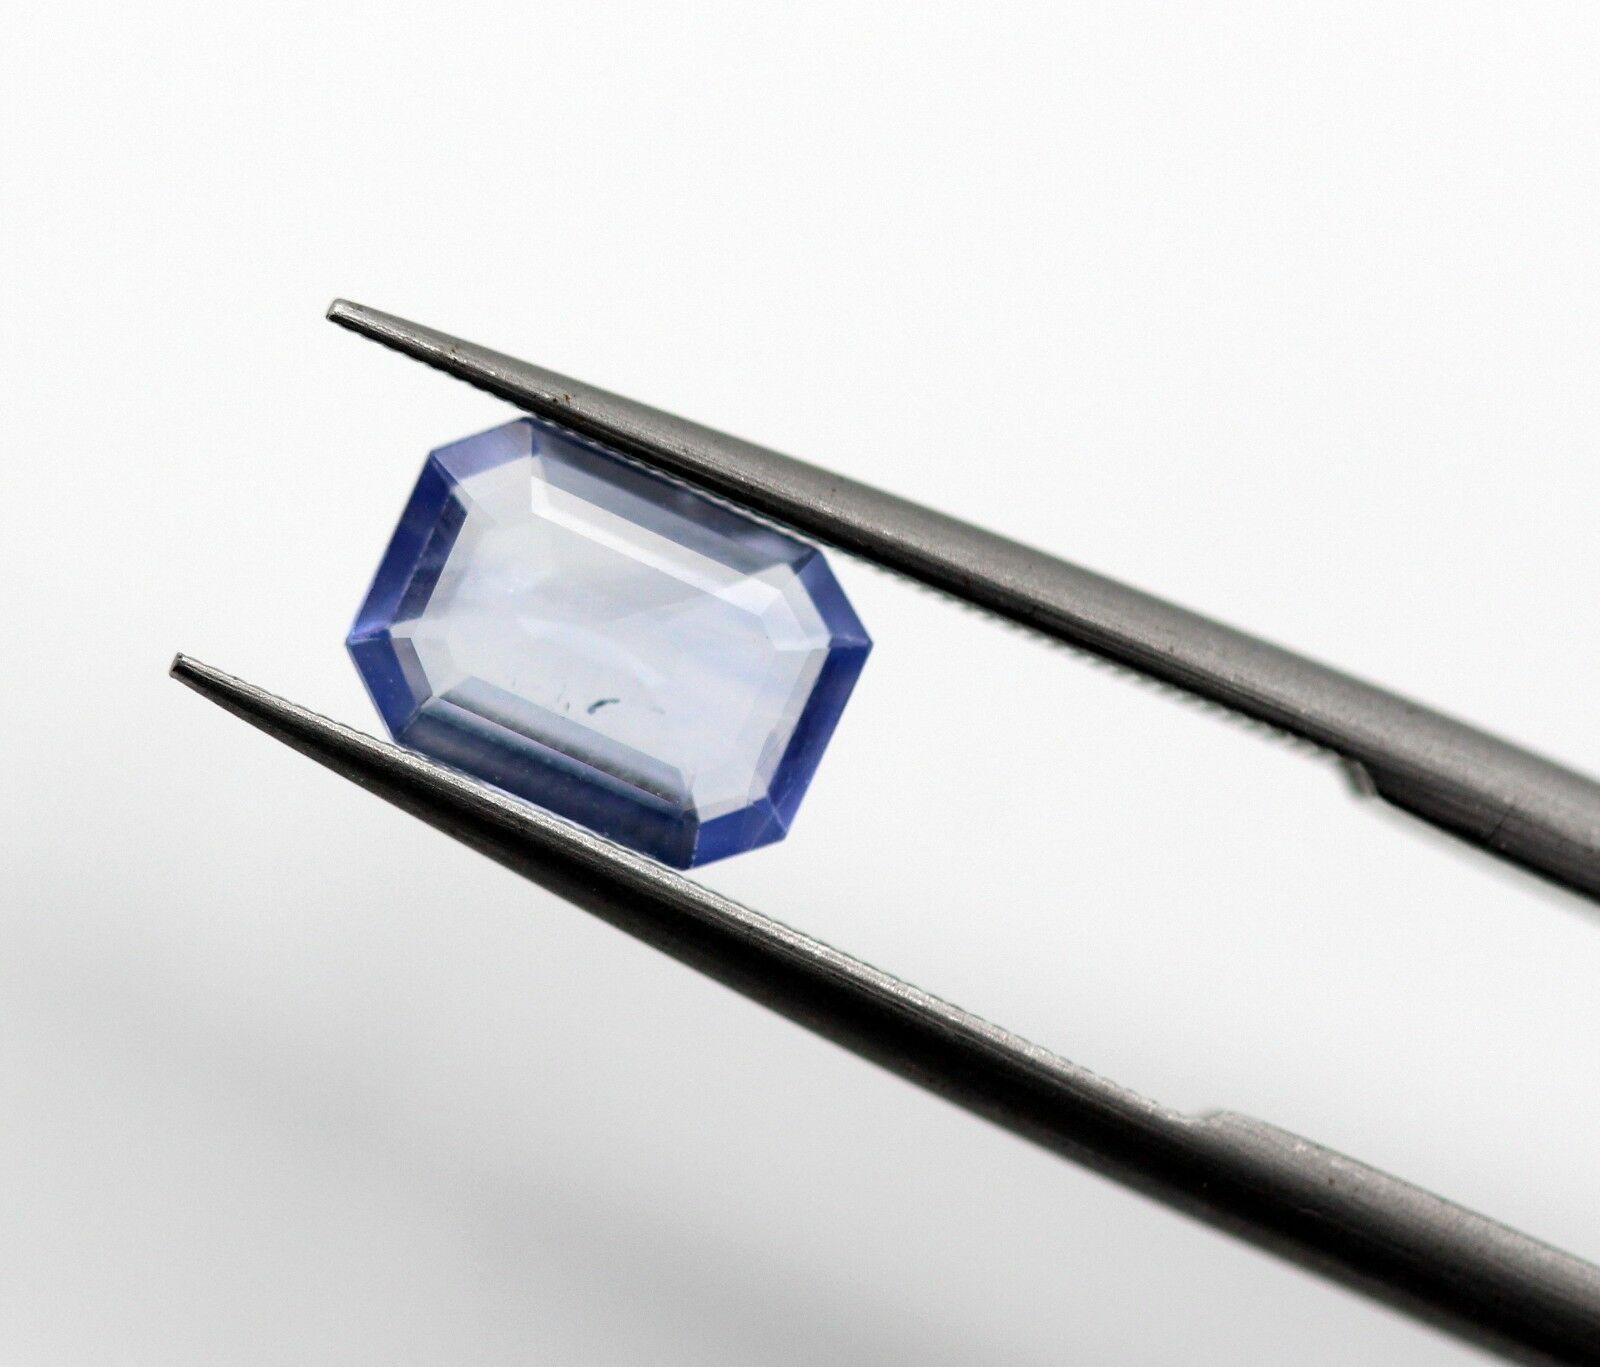 0.82 Ct Blue Sapphire Sri Lanka Octagon Cut Loose Natural Gemstone Light Blue Color Certified